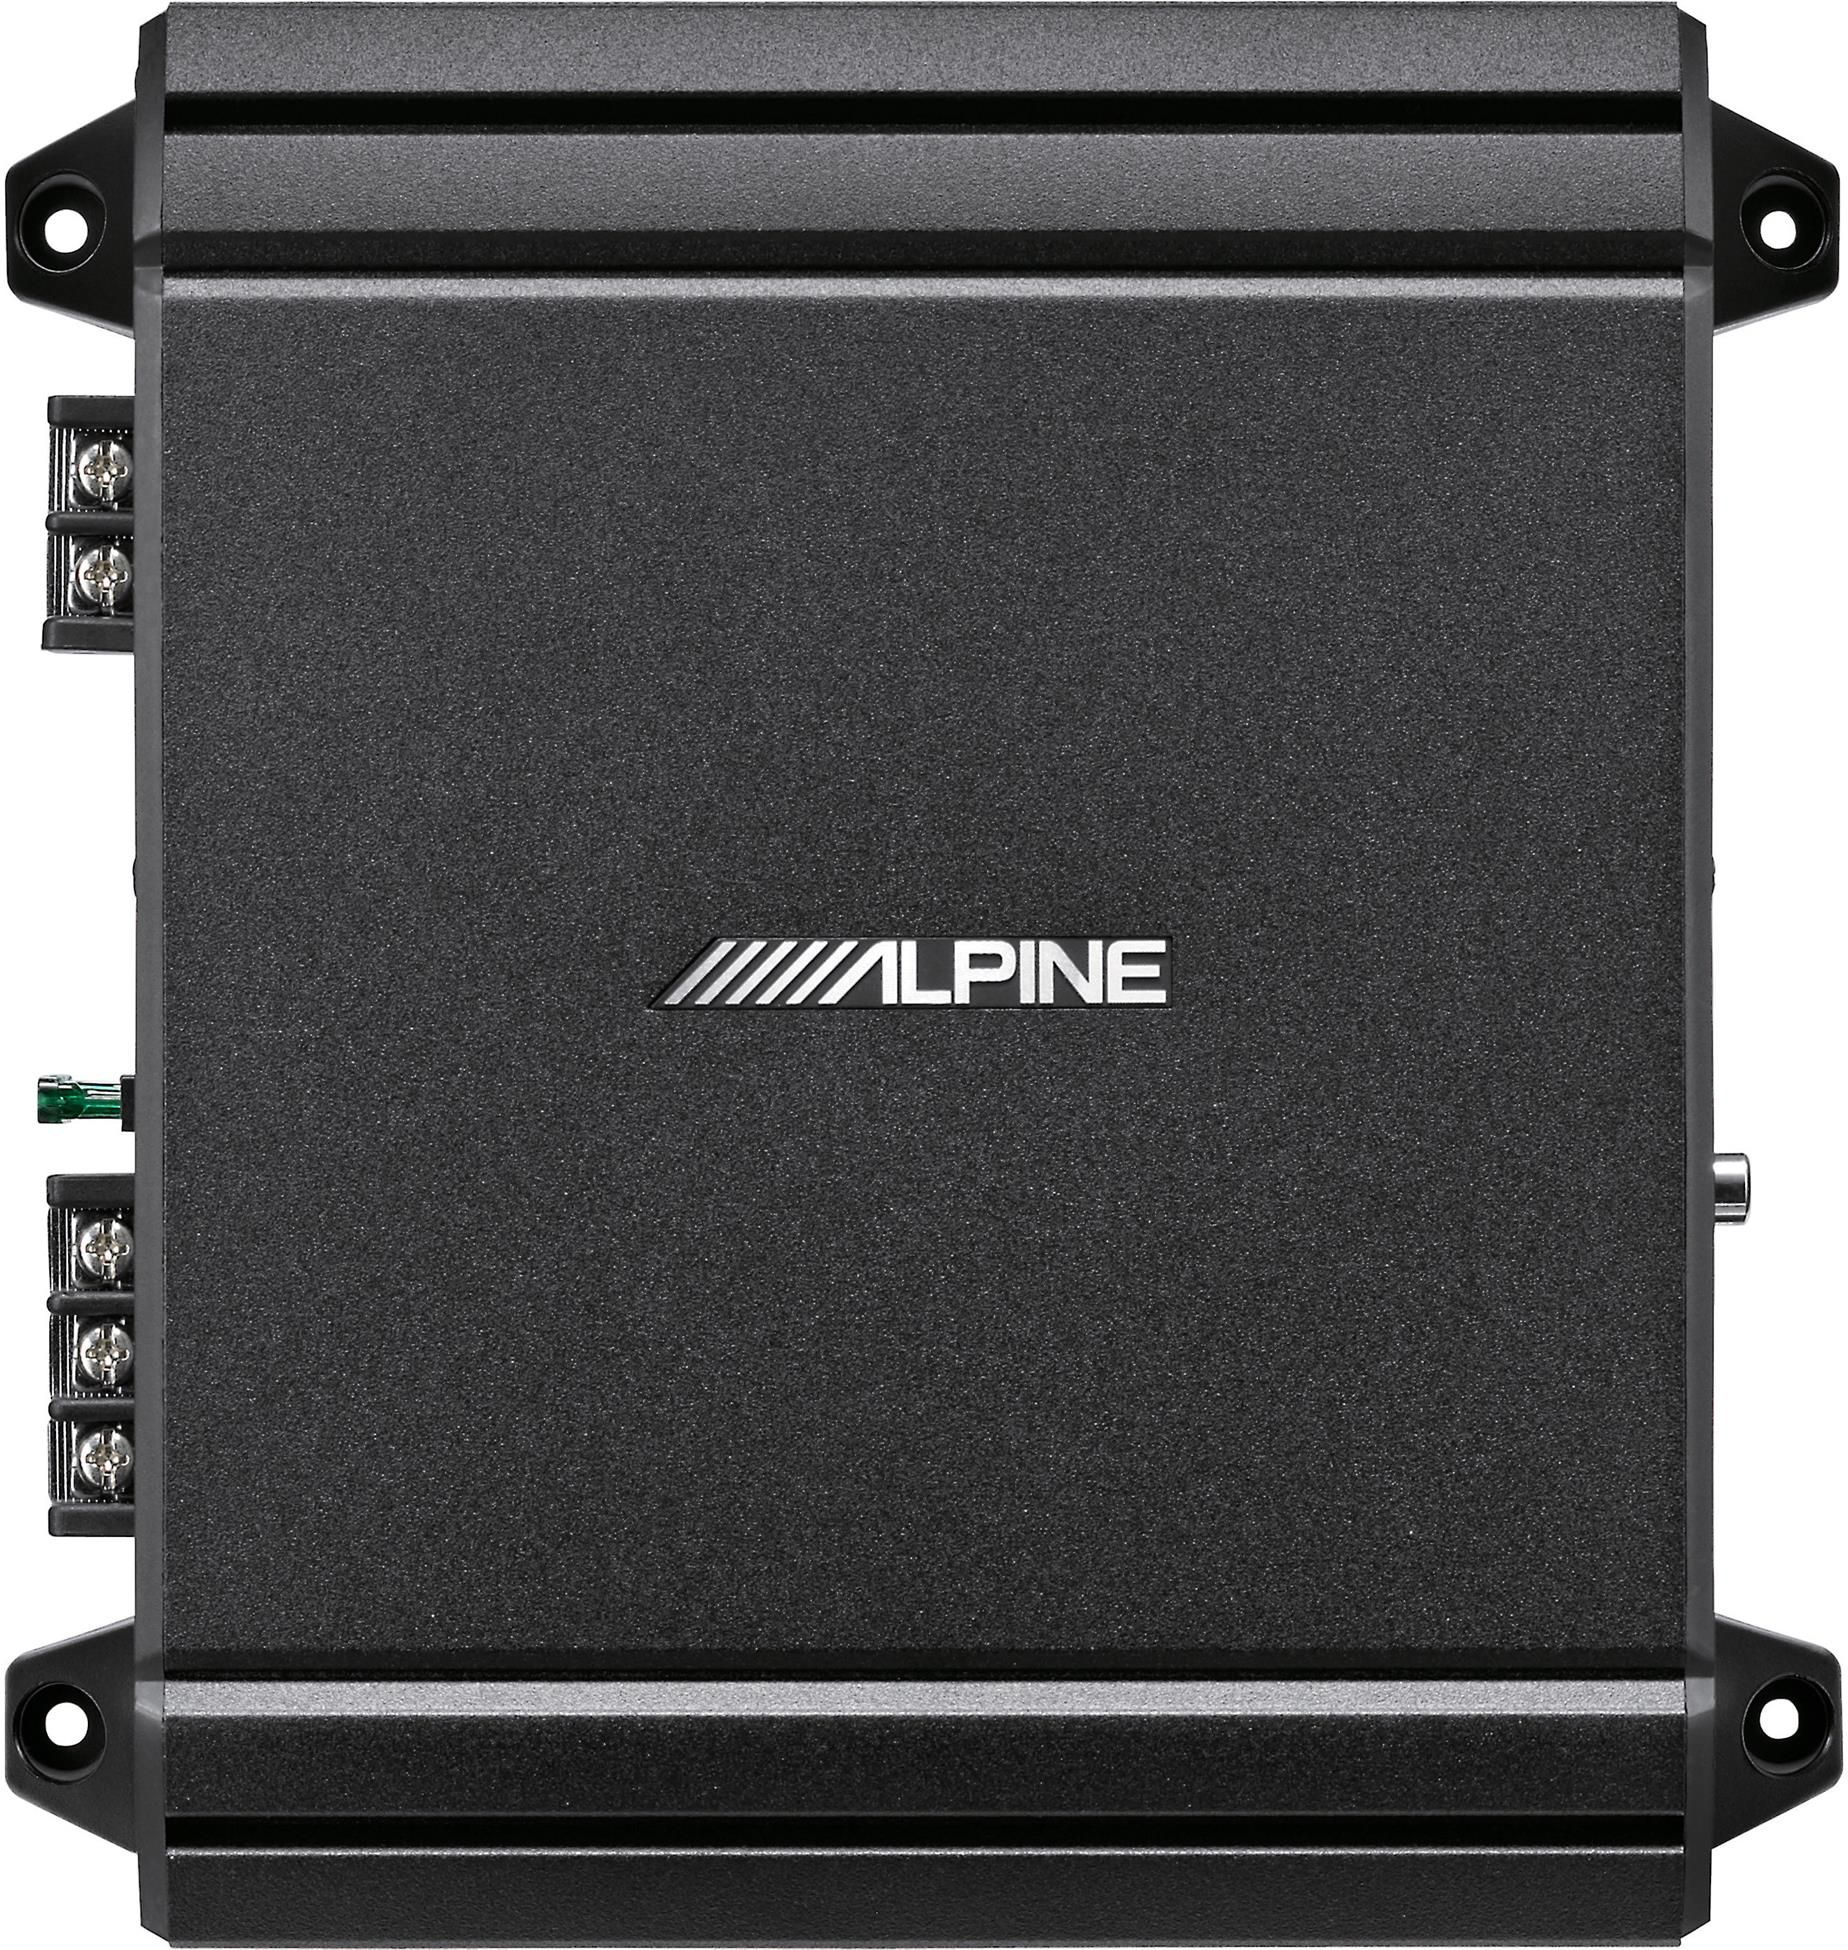 Car Amps Equalizers Residential Commercial Automotive Jl Audio Amplifiers Alpine 1 Channel Mono V Power Digital Amplifier Mrv M250